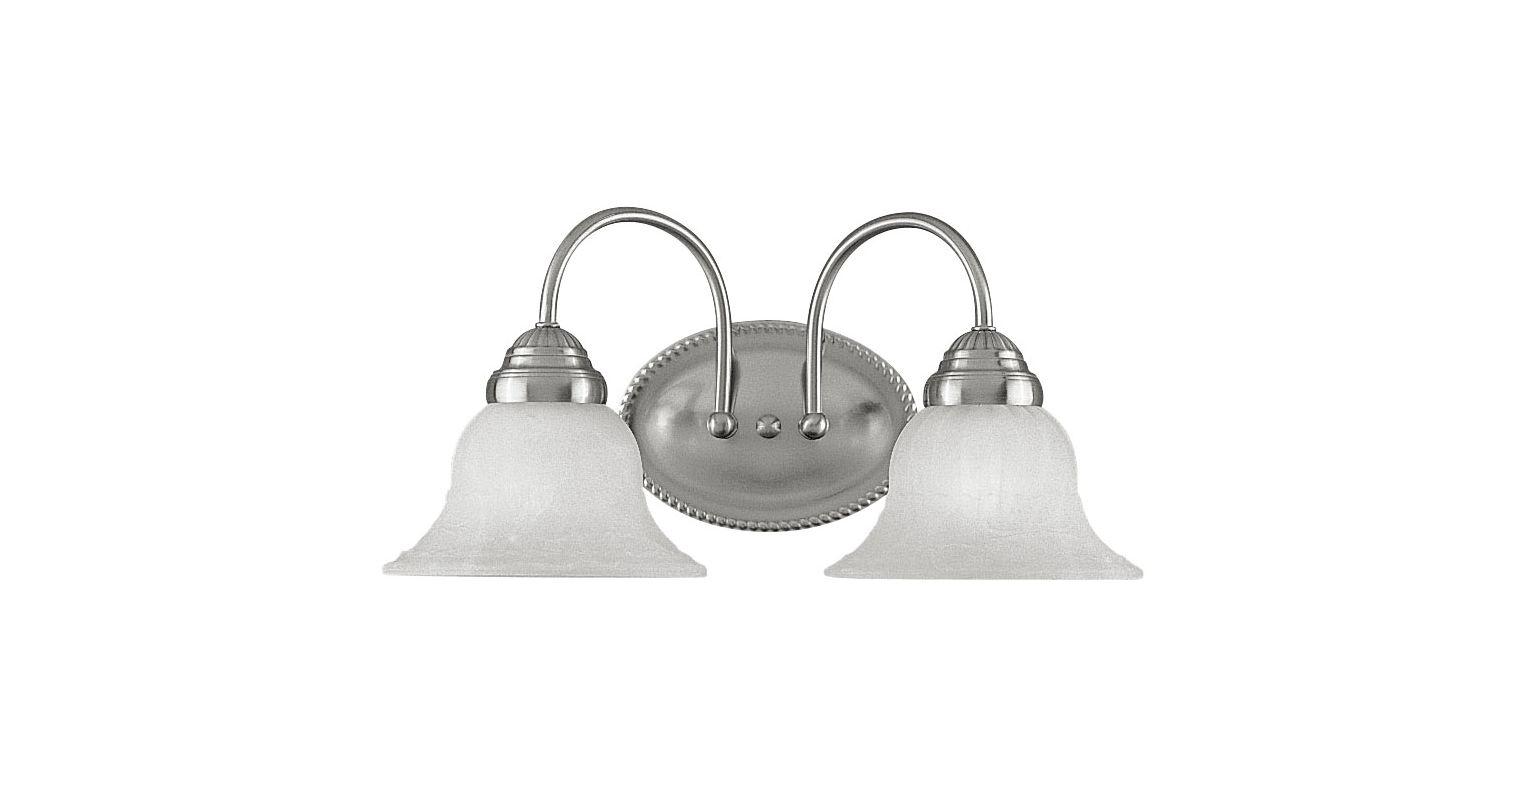 Livex Lighting 1532 Edgemont Bathroom Vanity Bar with 2 Lights Brushed